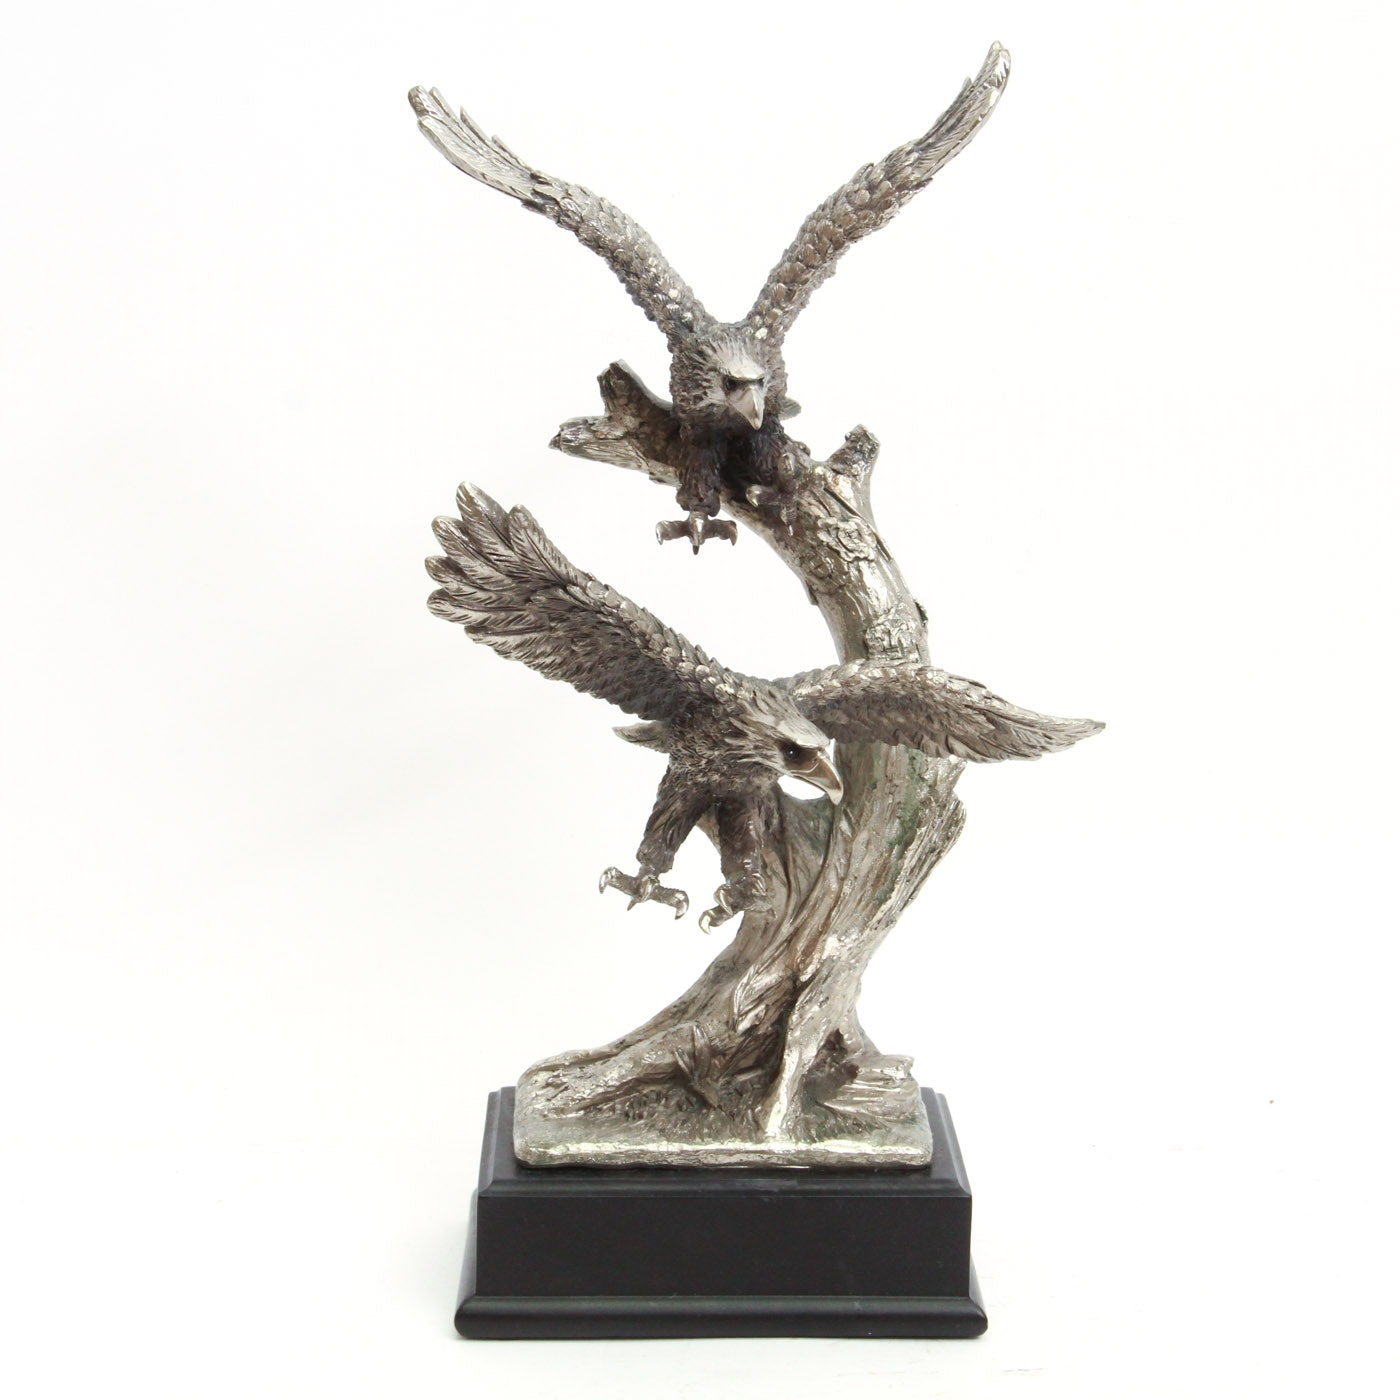 Chiseled Metal Double Eagle Sculpture